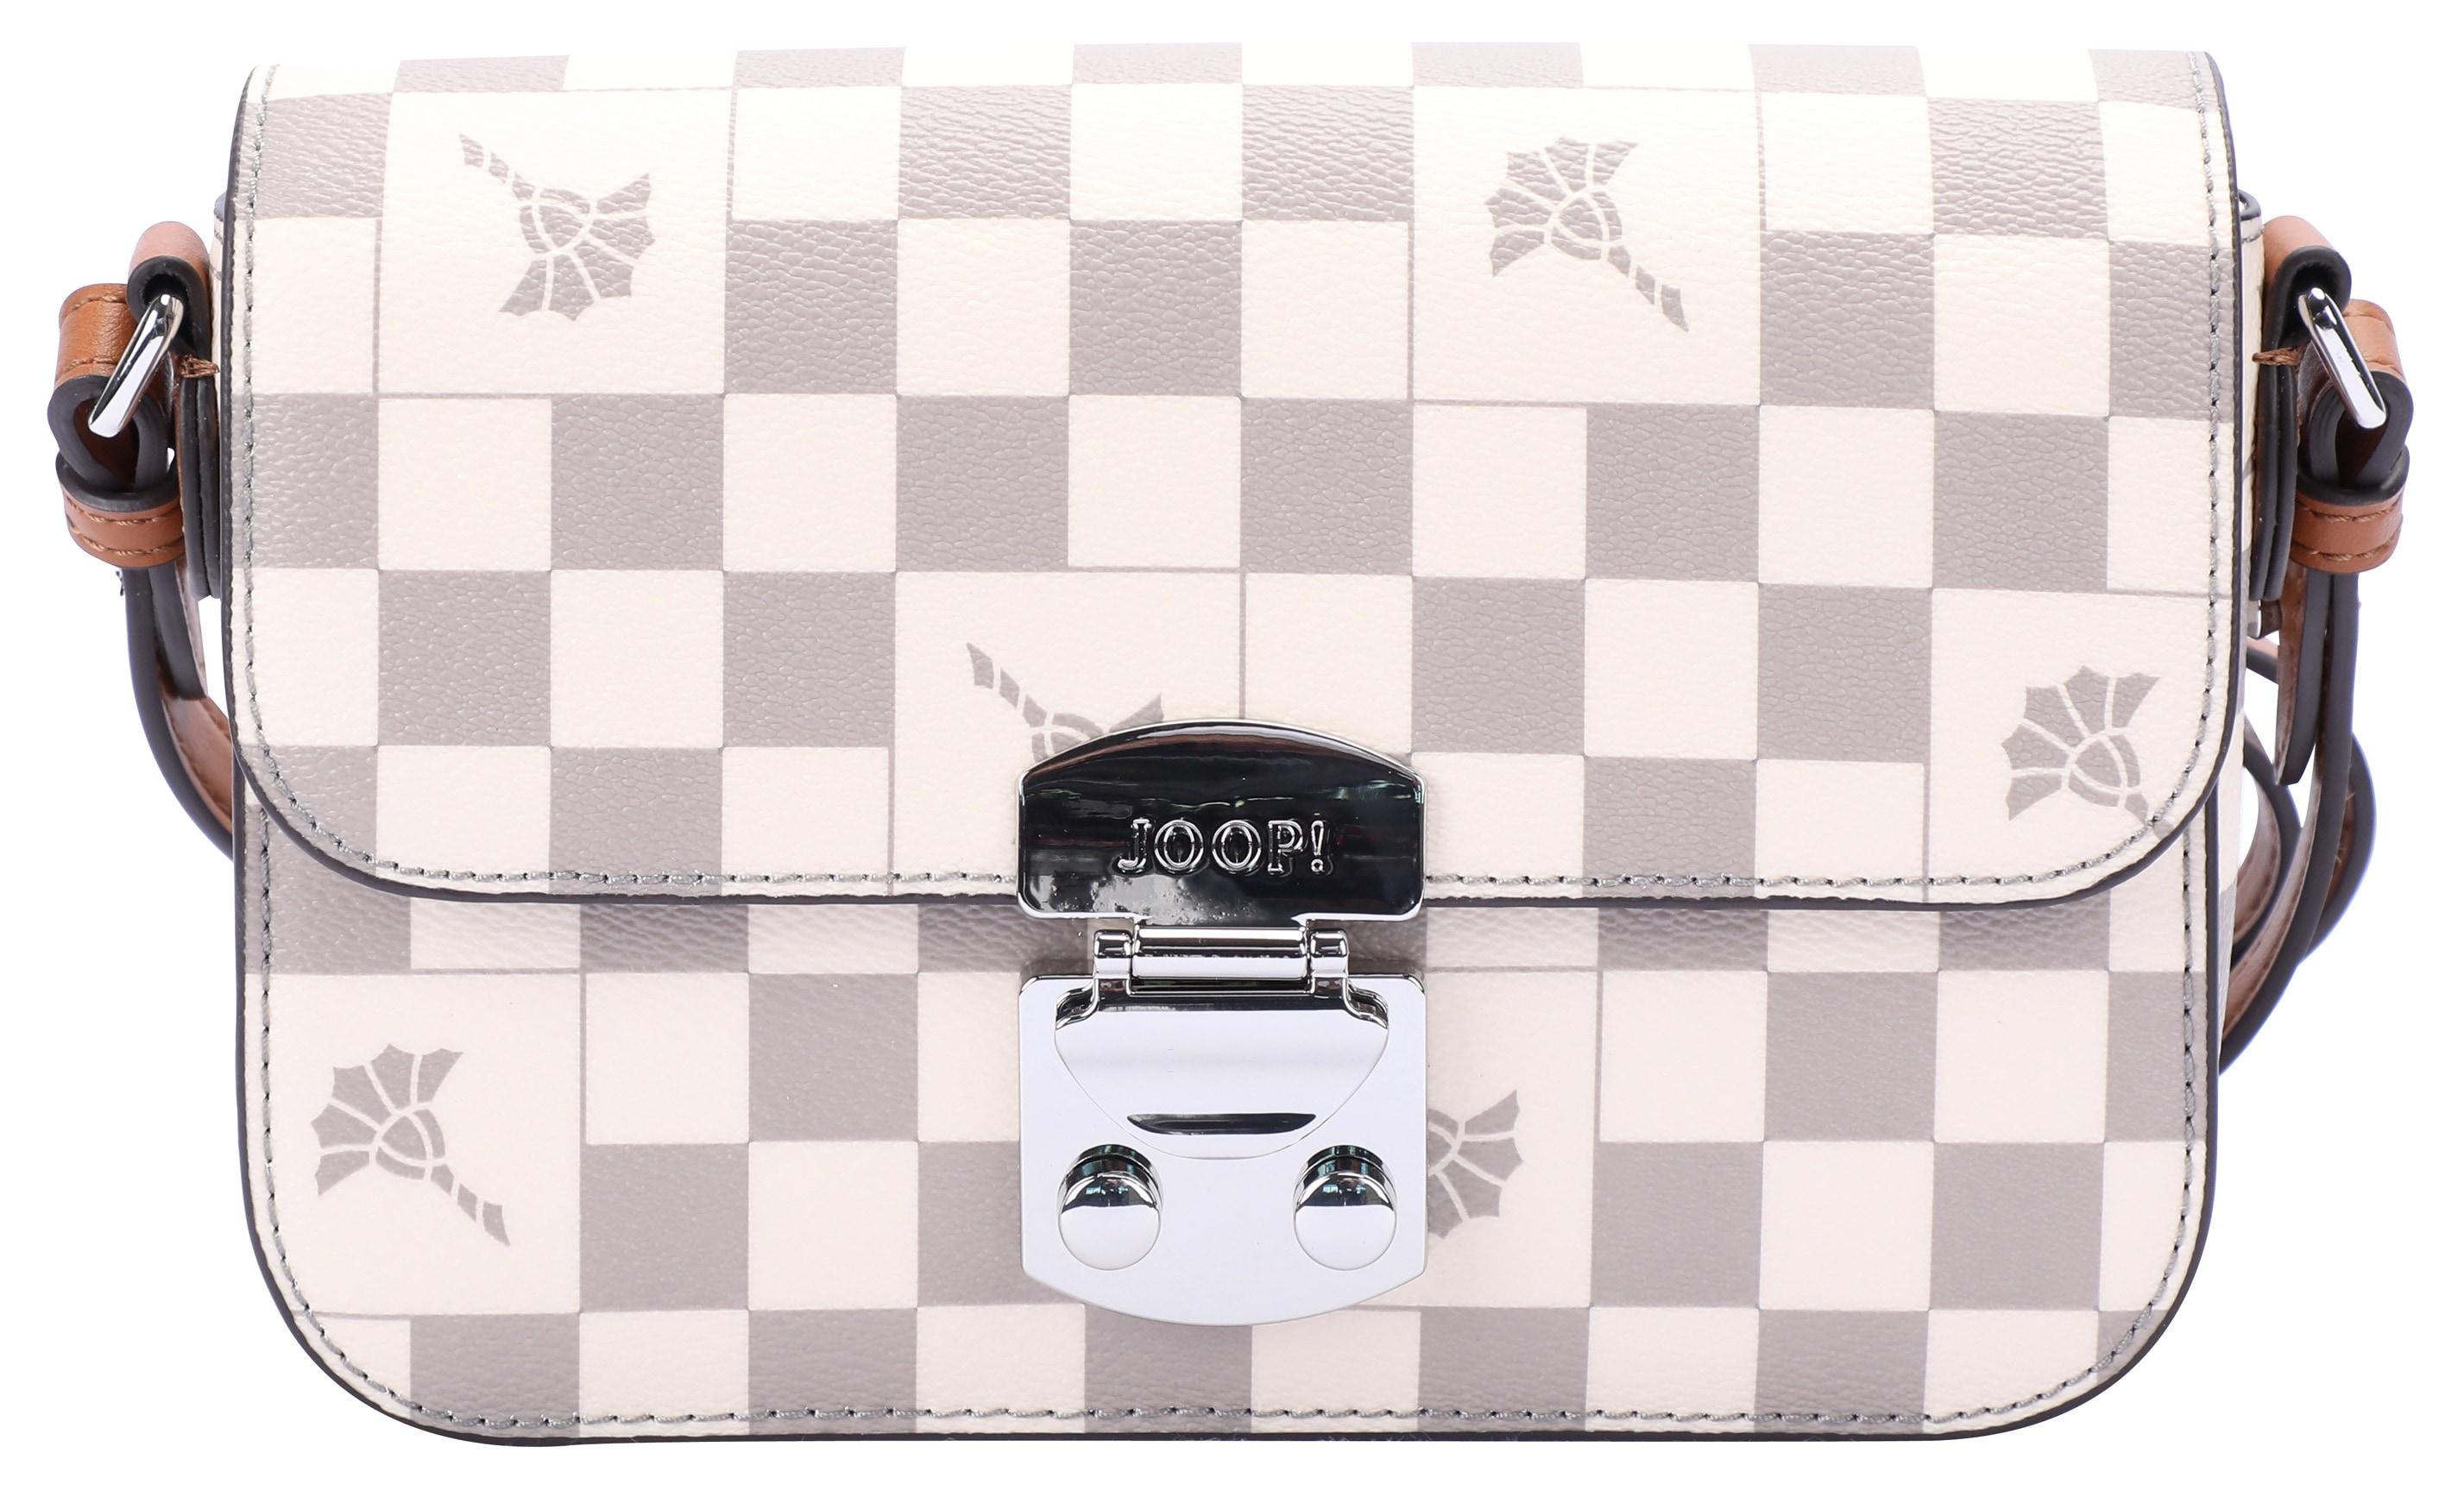 joop! - Joop Umhängetasche cortina piazza uma shoulderbag xshf, mit silberfarbenen Details